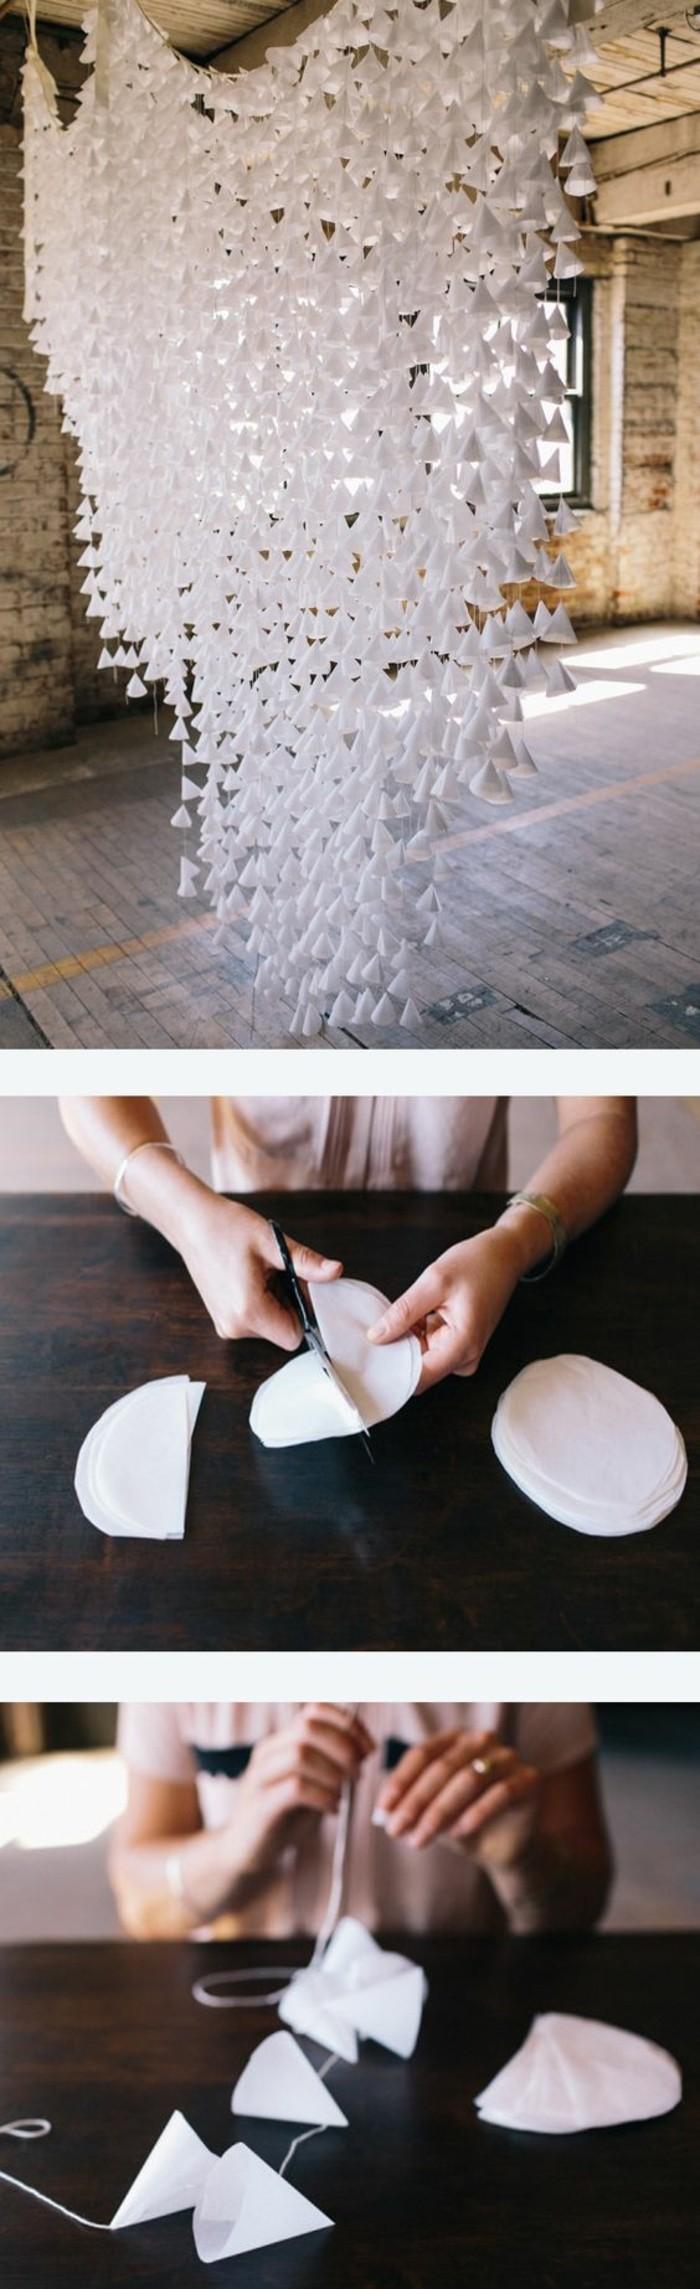 guirlande-en-papier-simple-a-realiser-des-petits-cones-de-papier-relies-avec-une-ficelle-un-bel-exemple-de-guirlande-diy-mariage